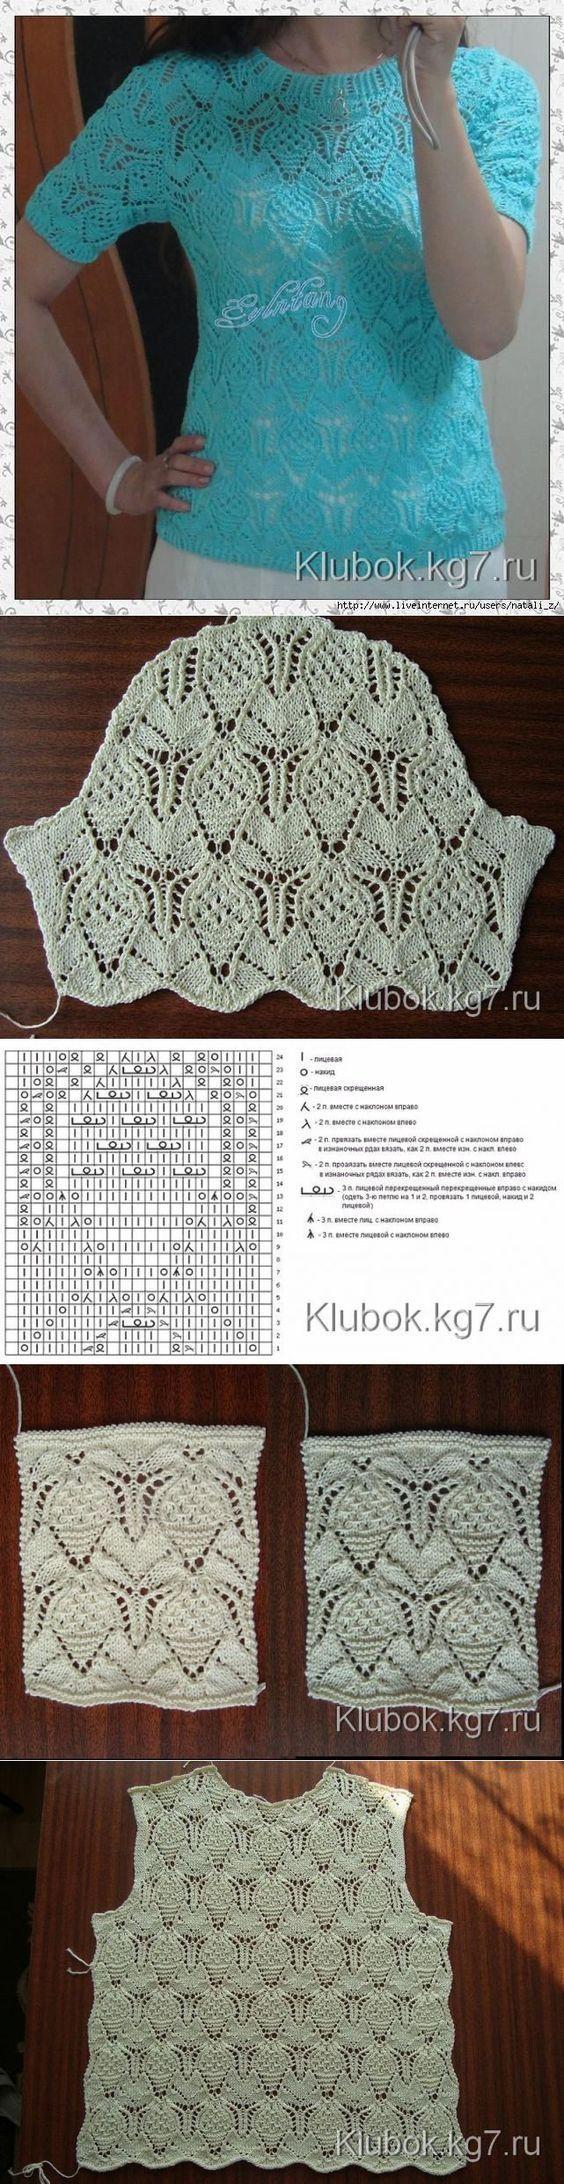 Hermosa Patrón Superior Crochet Encaje Festooning - Manta de Tejer ...